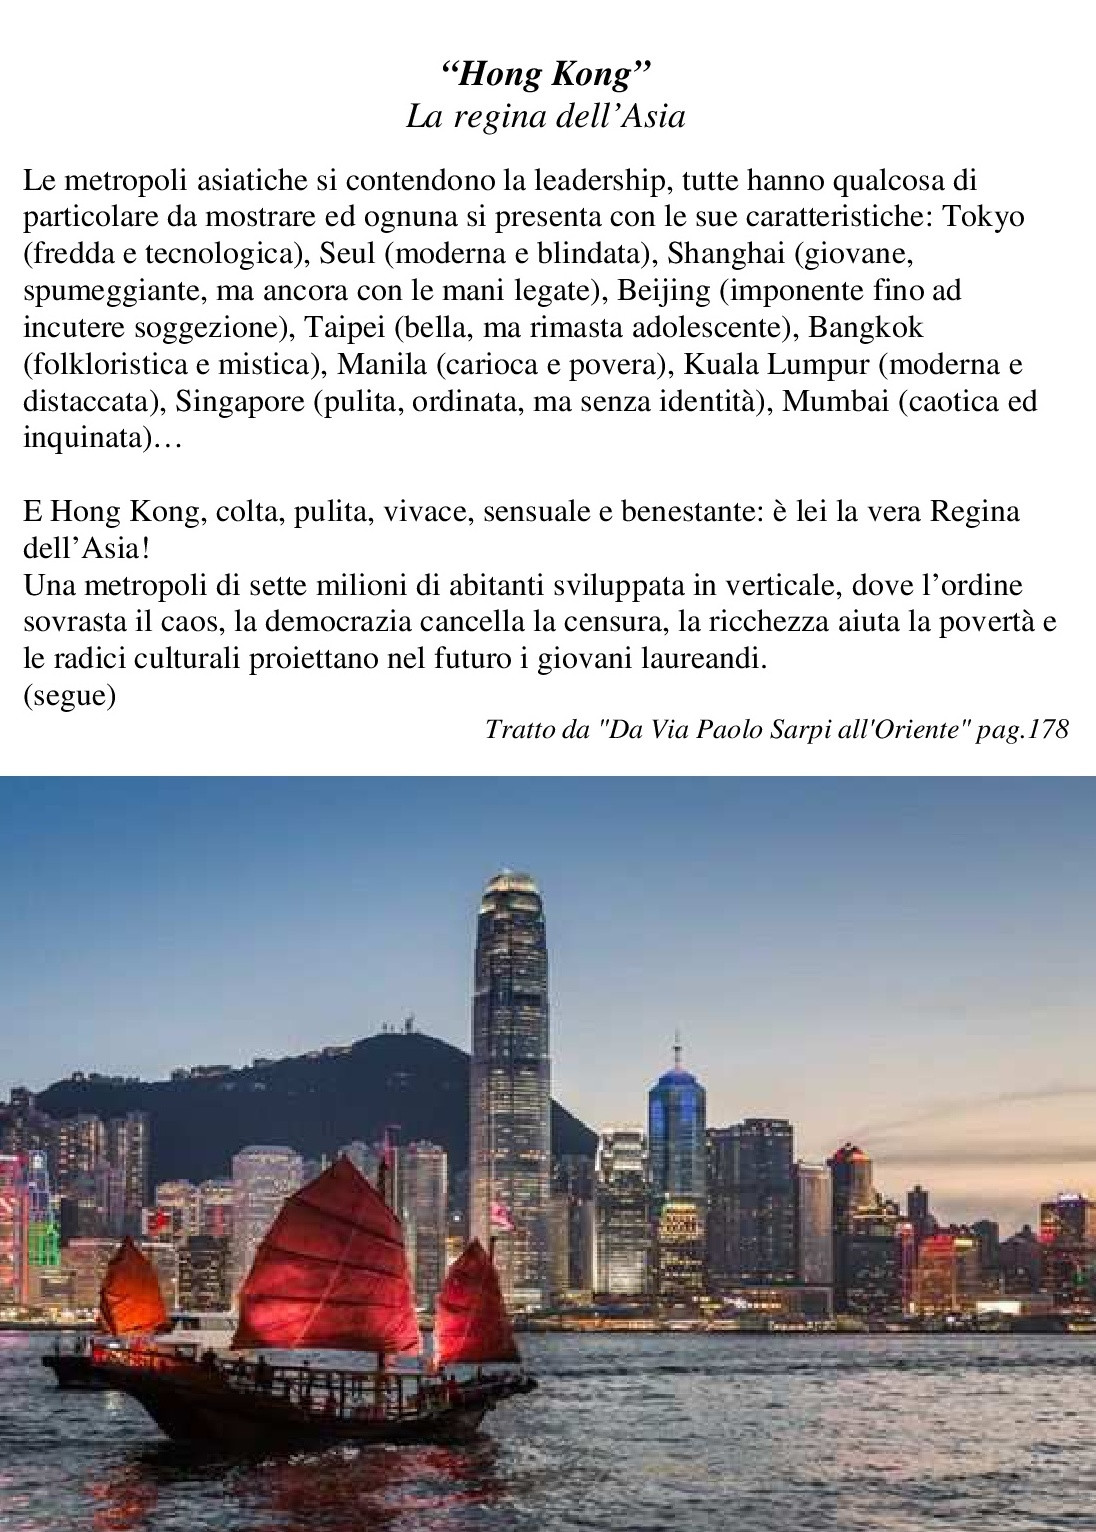 21 Poster Hong Kong.jpg